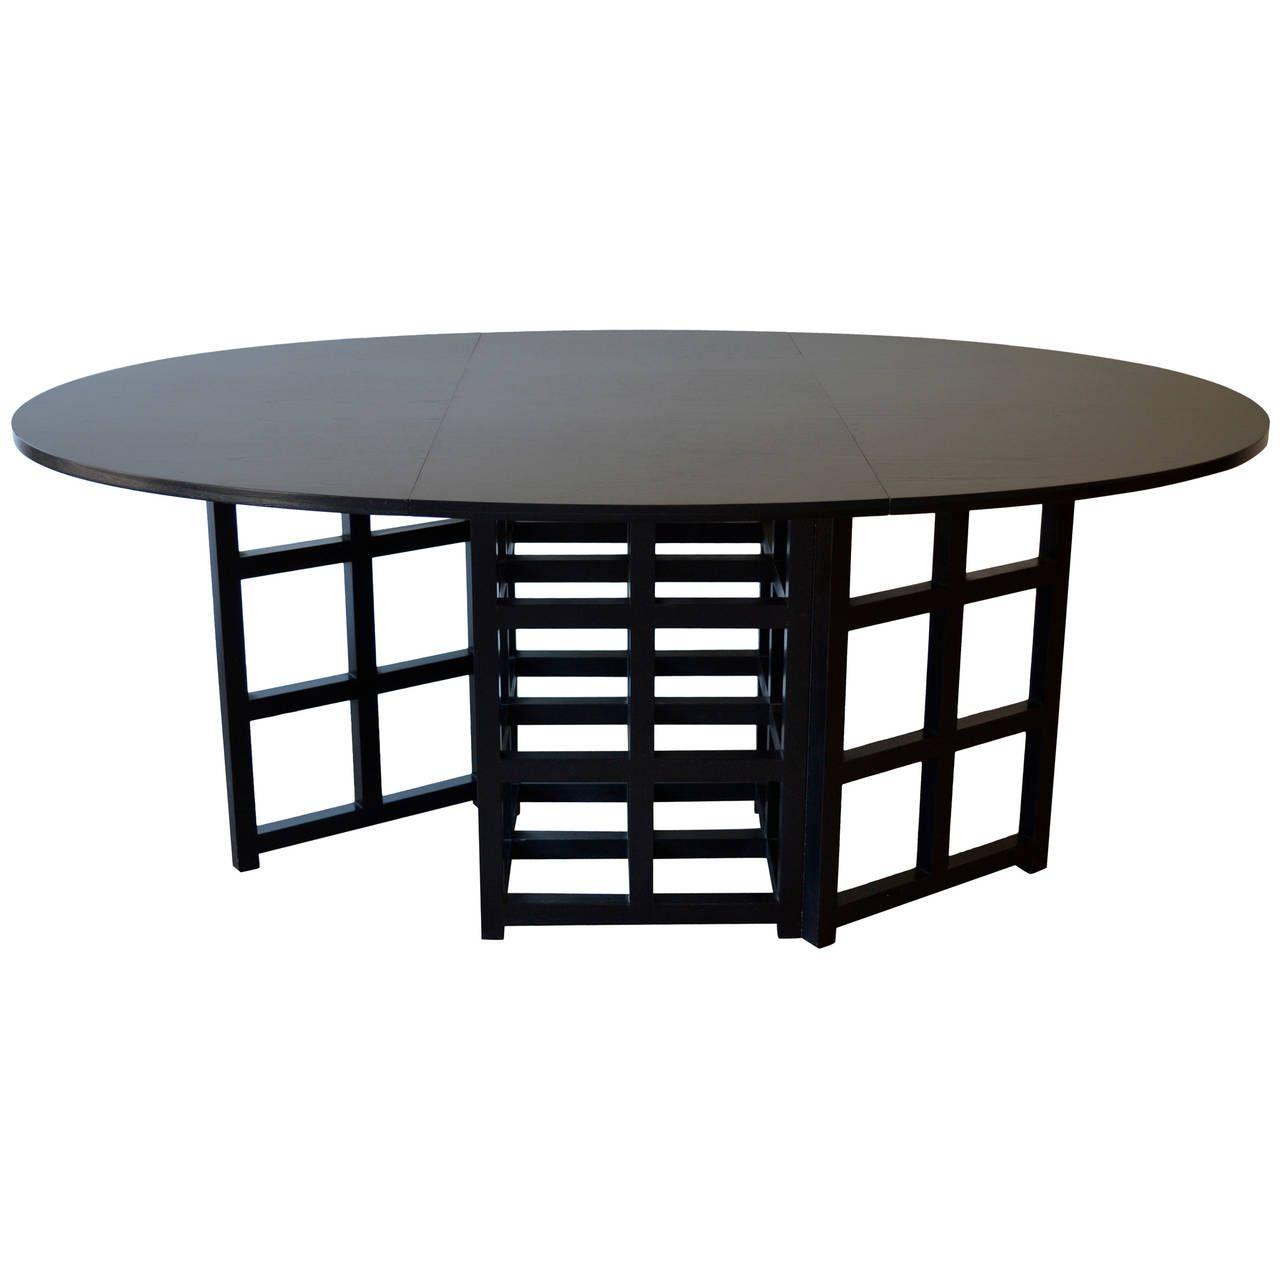 Oval Black Drop Leaf Dining Table By Charles Rennie Mackintosh 1